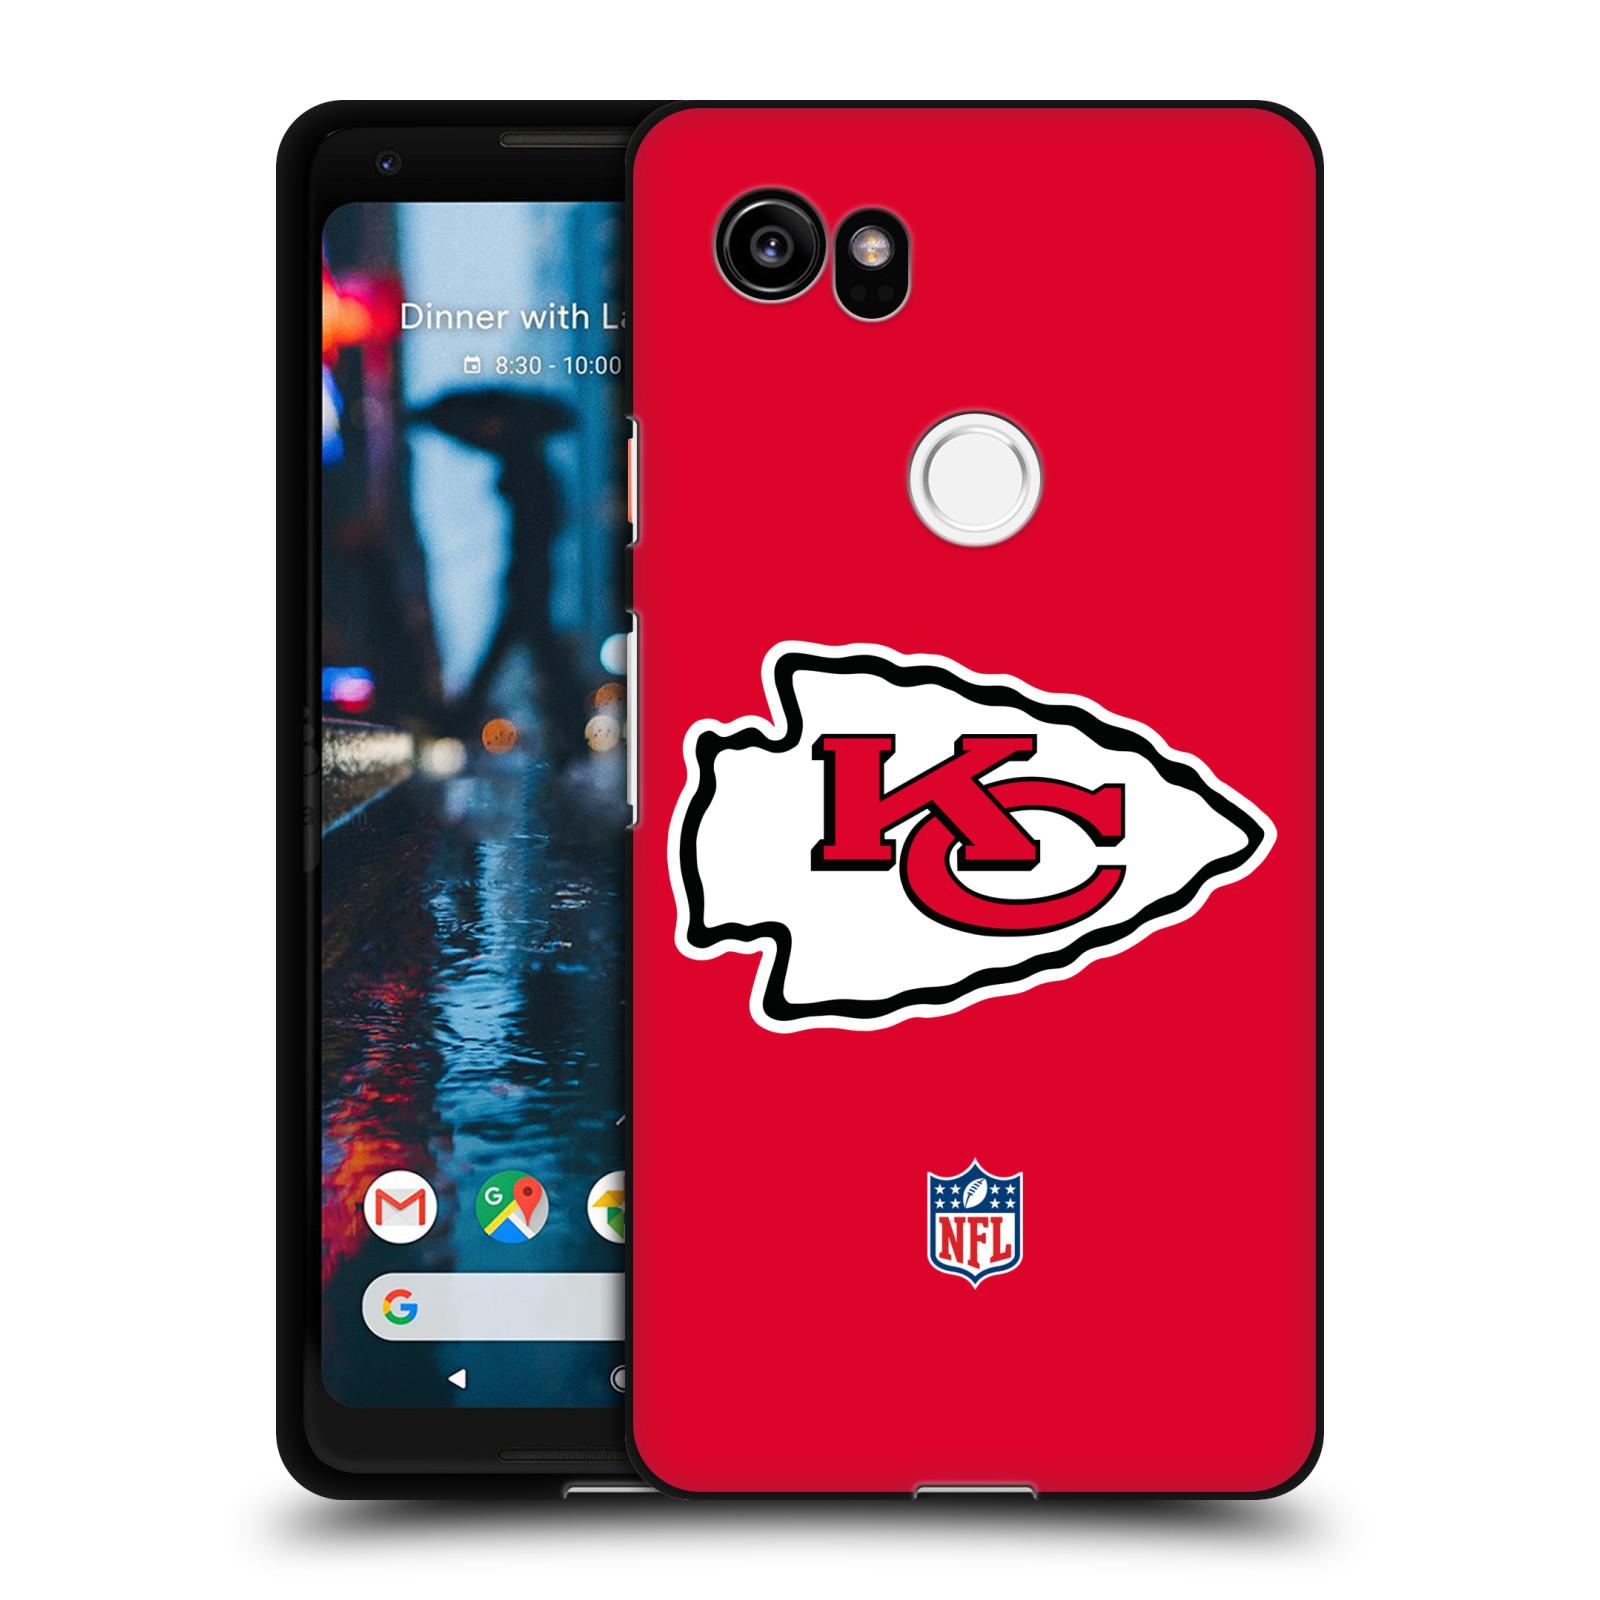 OFFICIAL-NFL-KANSAS-CITY-CHIEFS-LOGO-BLACK-SOFT-GEL-CASE-FOR-GOOGLE-PHONES